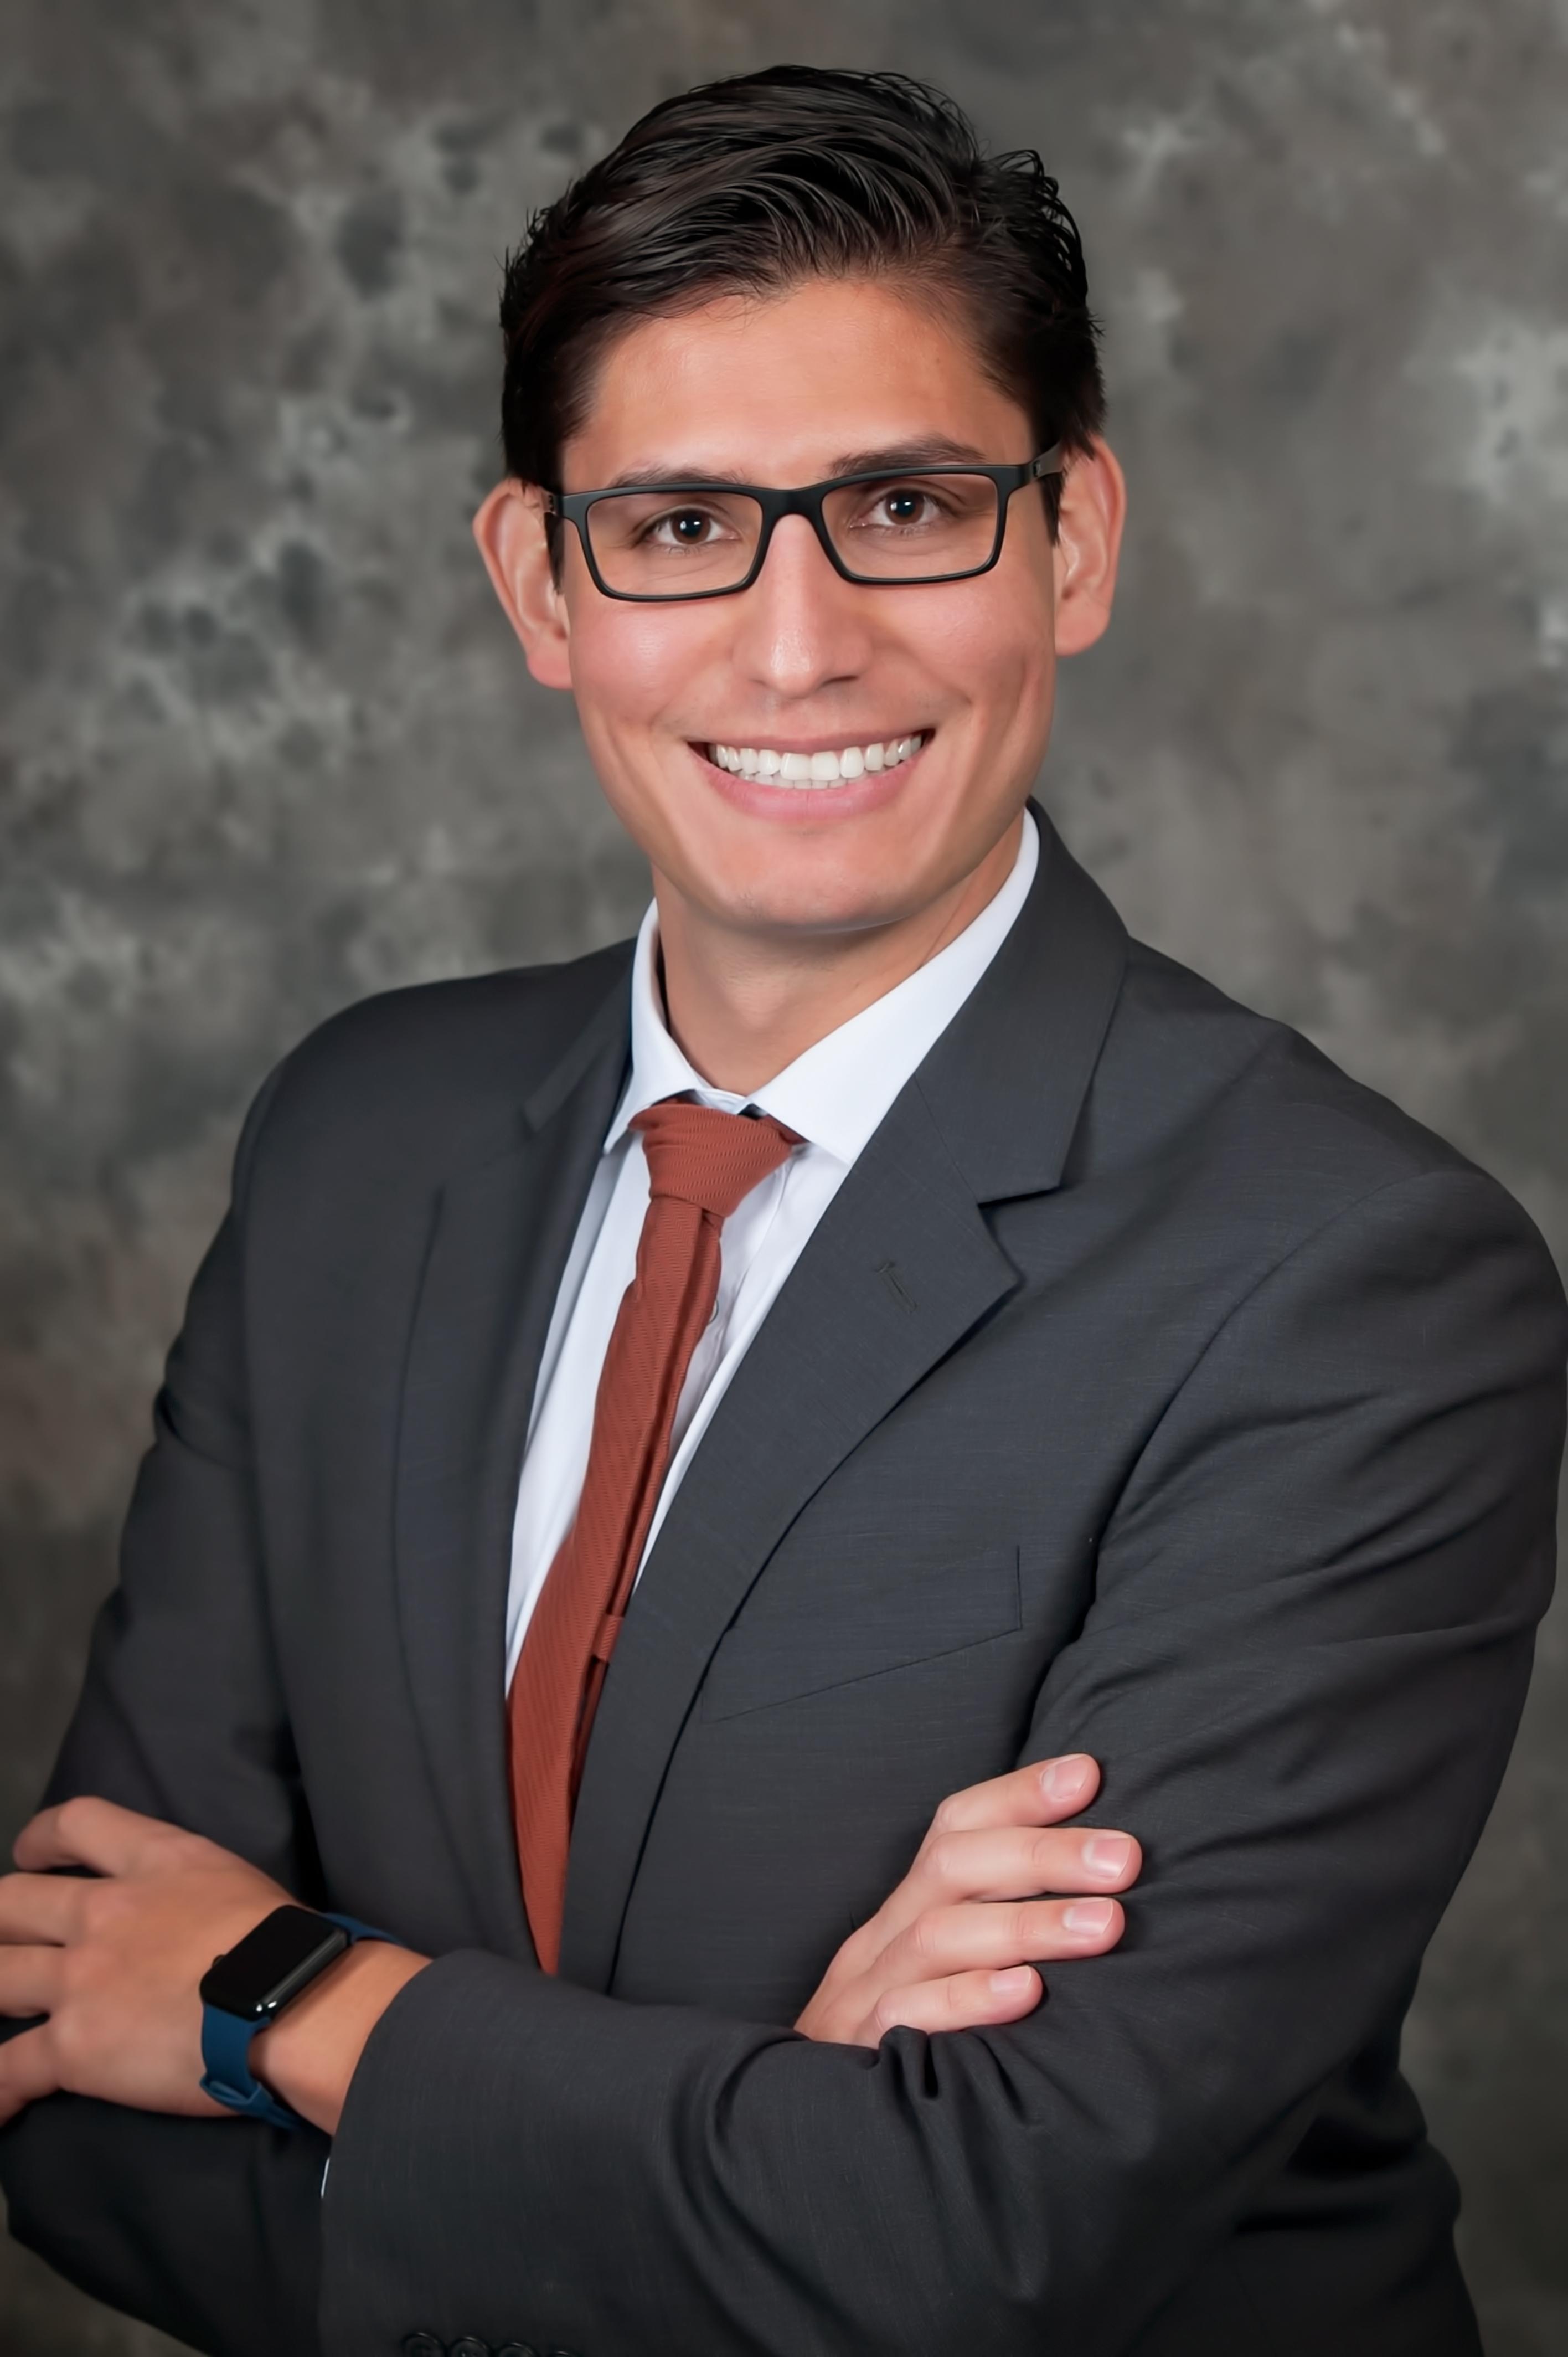 Horacio Alvarez Ramirez, MD